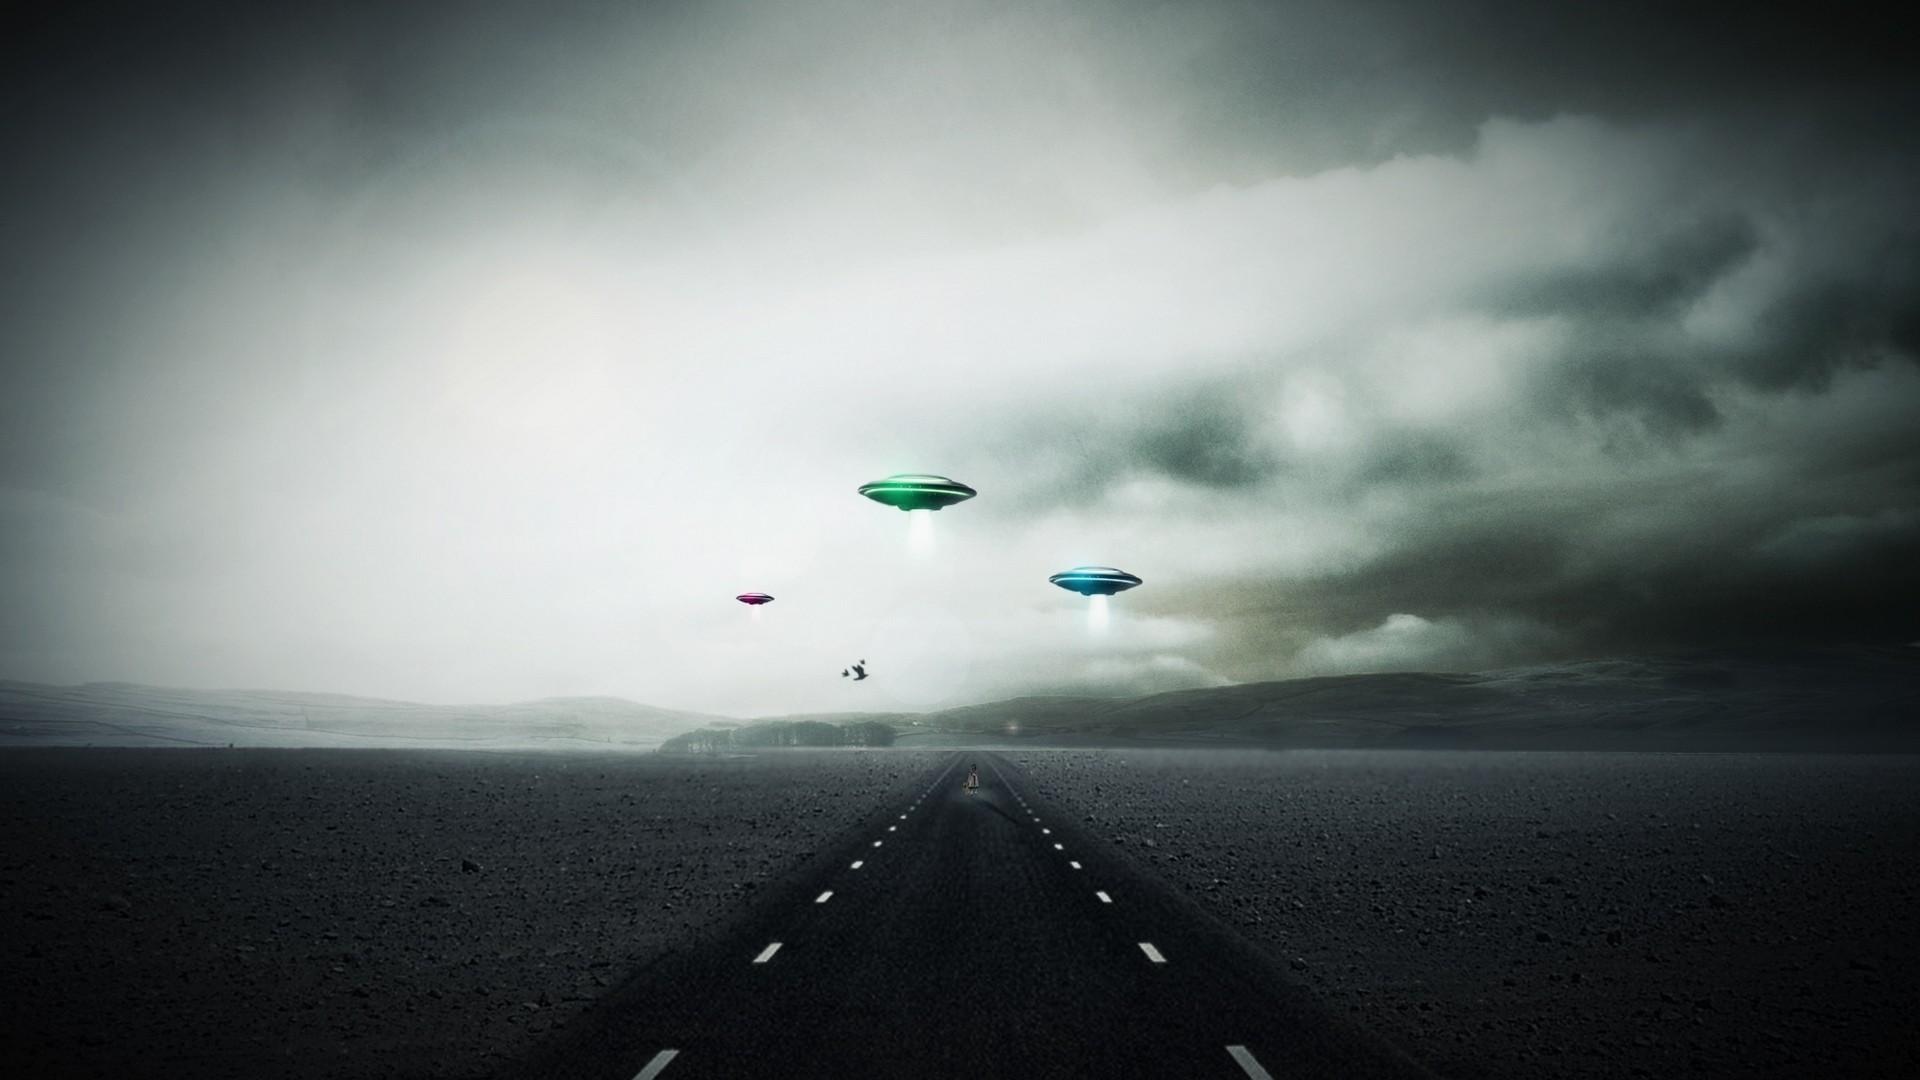 Sci fi invasion ufo spaceship spacecraft roads landscapes sky clouds alien  wallpaper | | 30775 | WallpaperUP